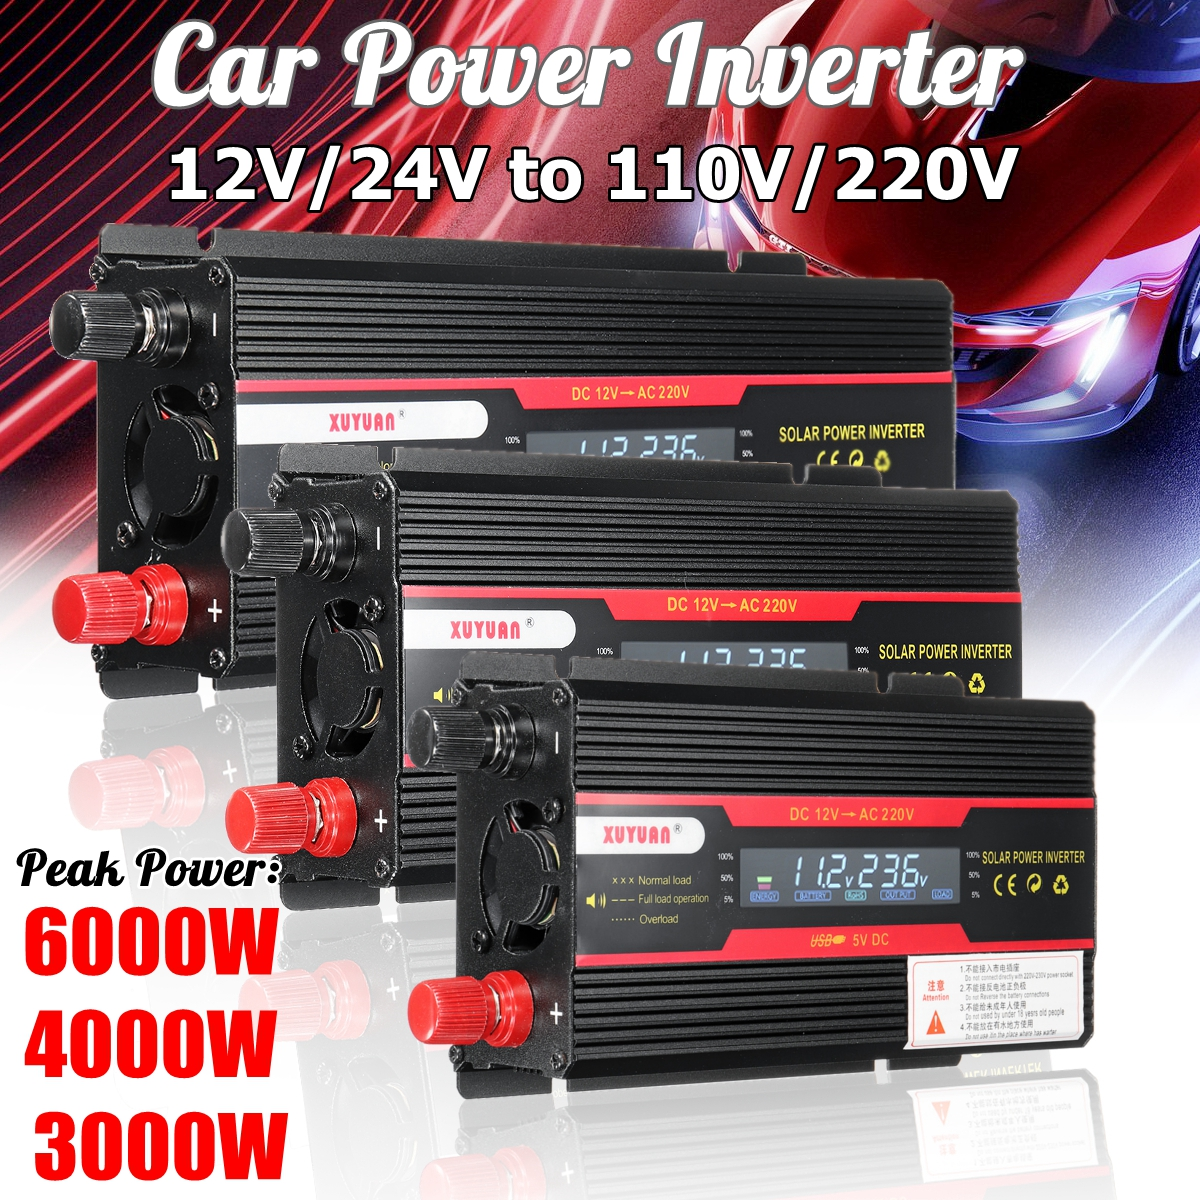 Dual Usb 2000w Watt Dc 12v To Ac 220v Portable Car Power Inverter Using 555 3000w 4000w 6000w P Eak Voltage Convertor Transformer